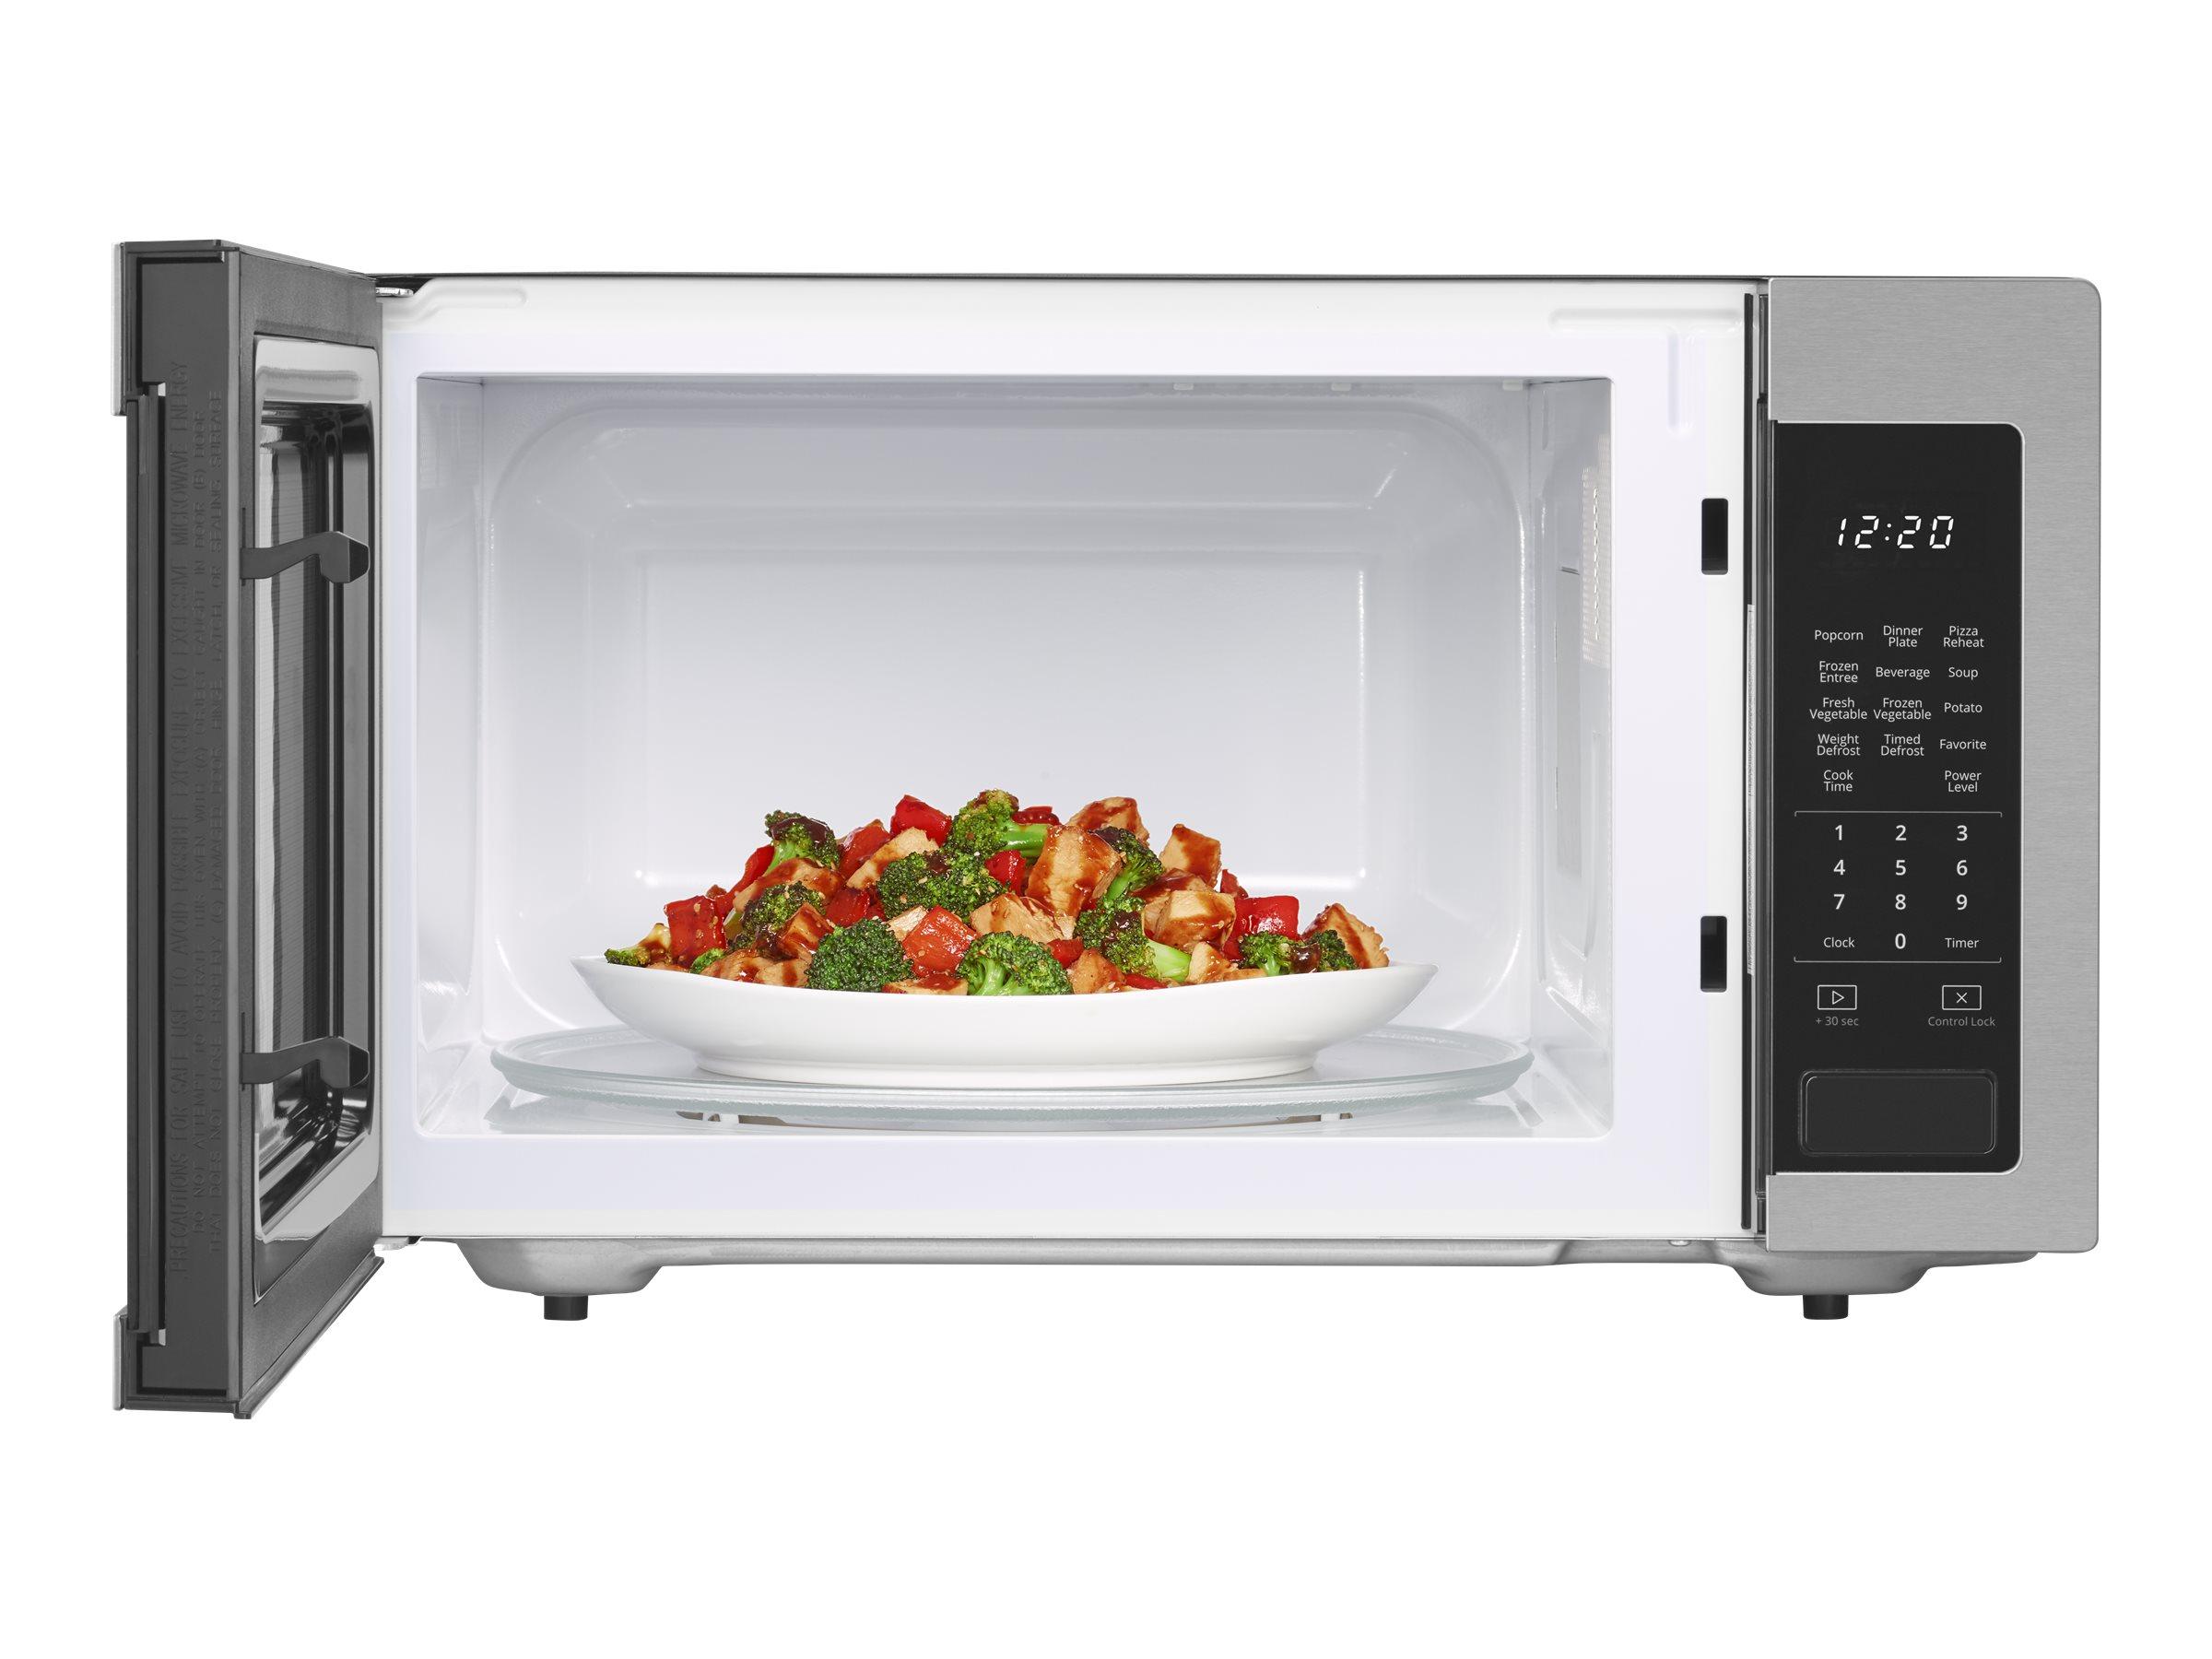 whirlpool wmc30516hz microwave oven freestanding 1 6 cu ft 1200 w stainless steel